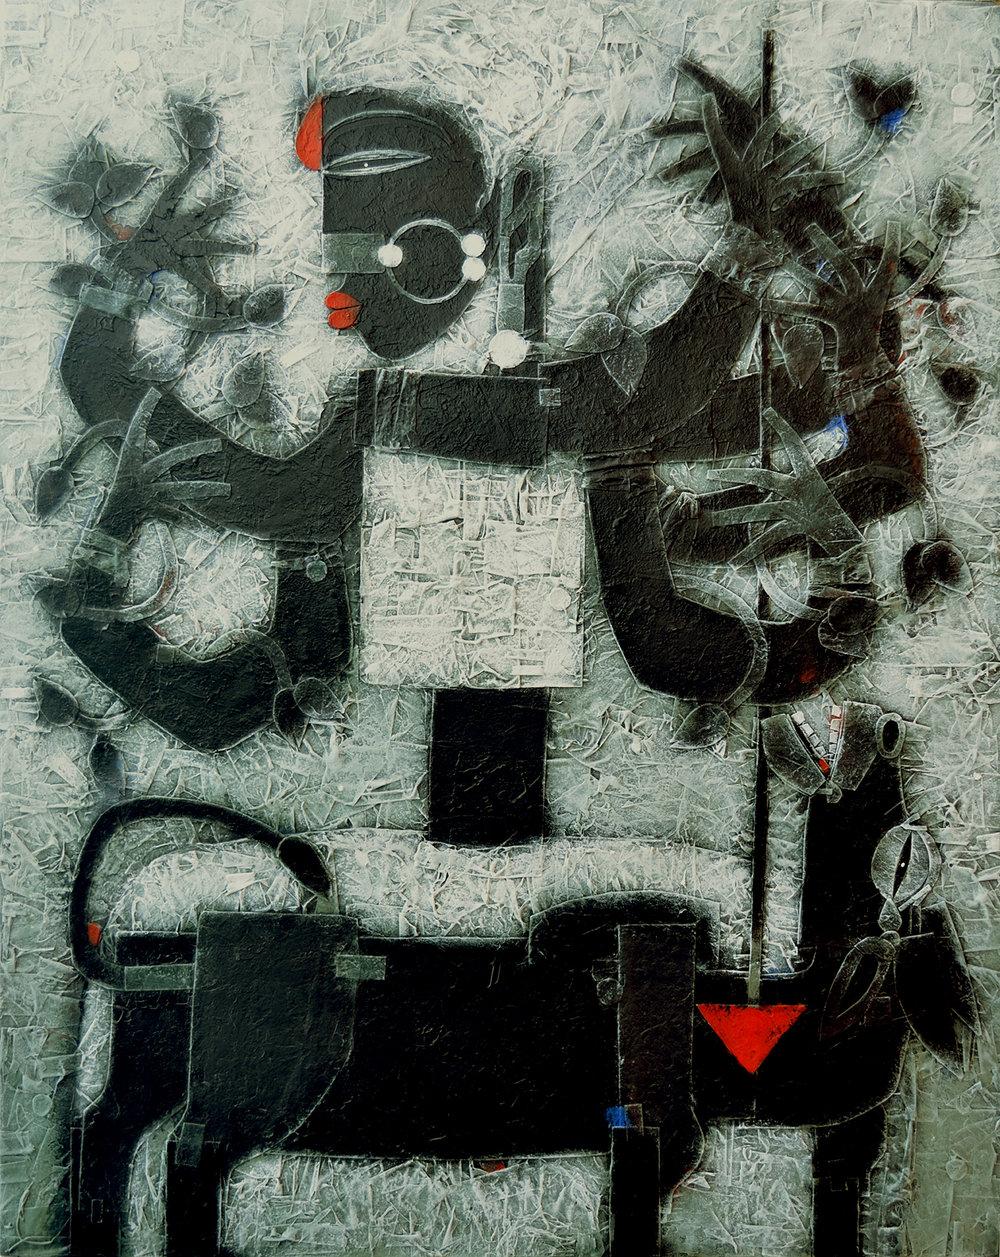 Goddess Durga - Feminine Energy, Mixed media on canvas, 60 x 48